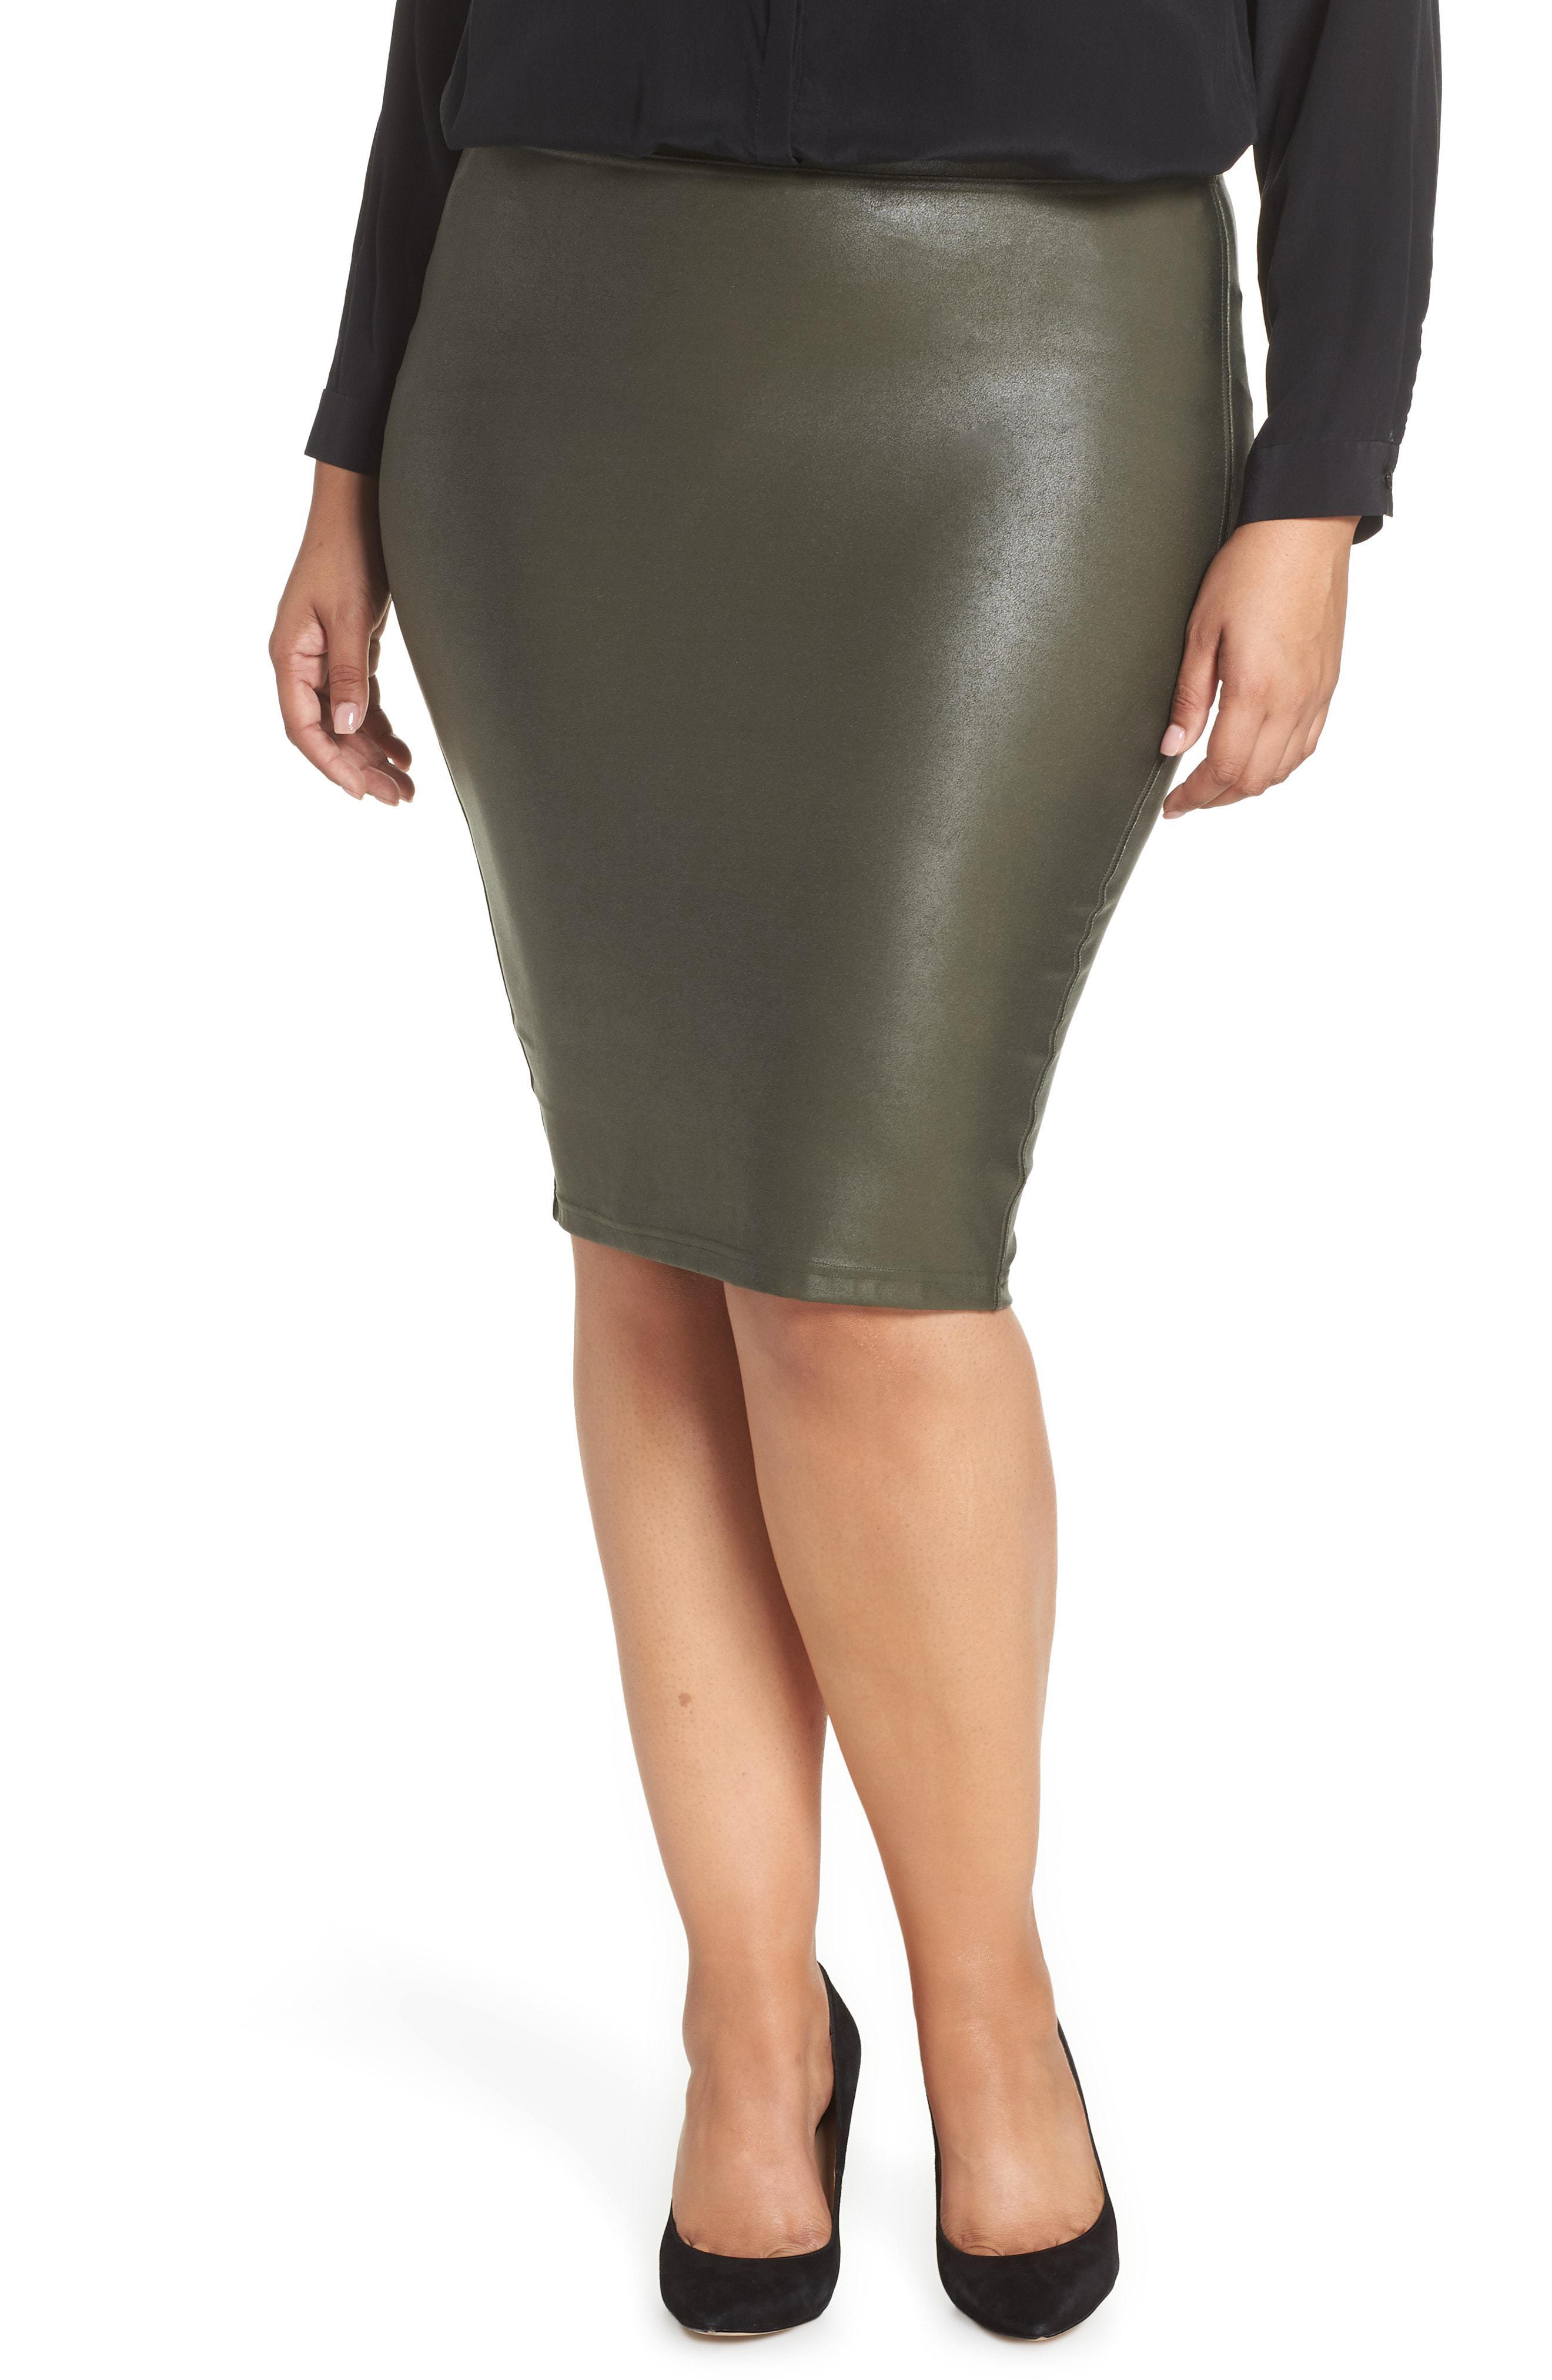 43d86adb15459 Gallery. Previously sold at: Nordstrom · Women's Dark Green Skirt ...